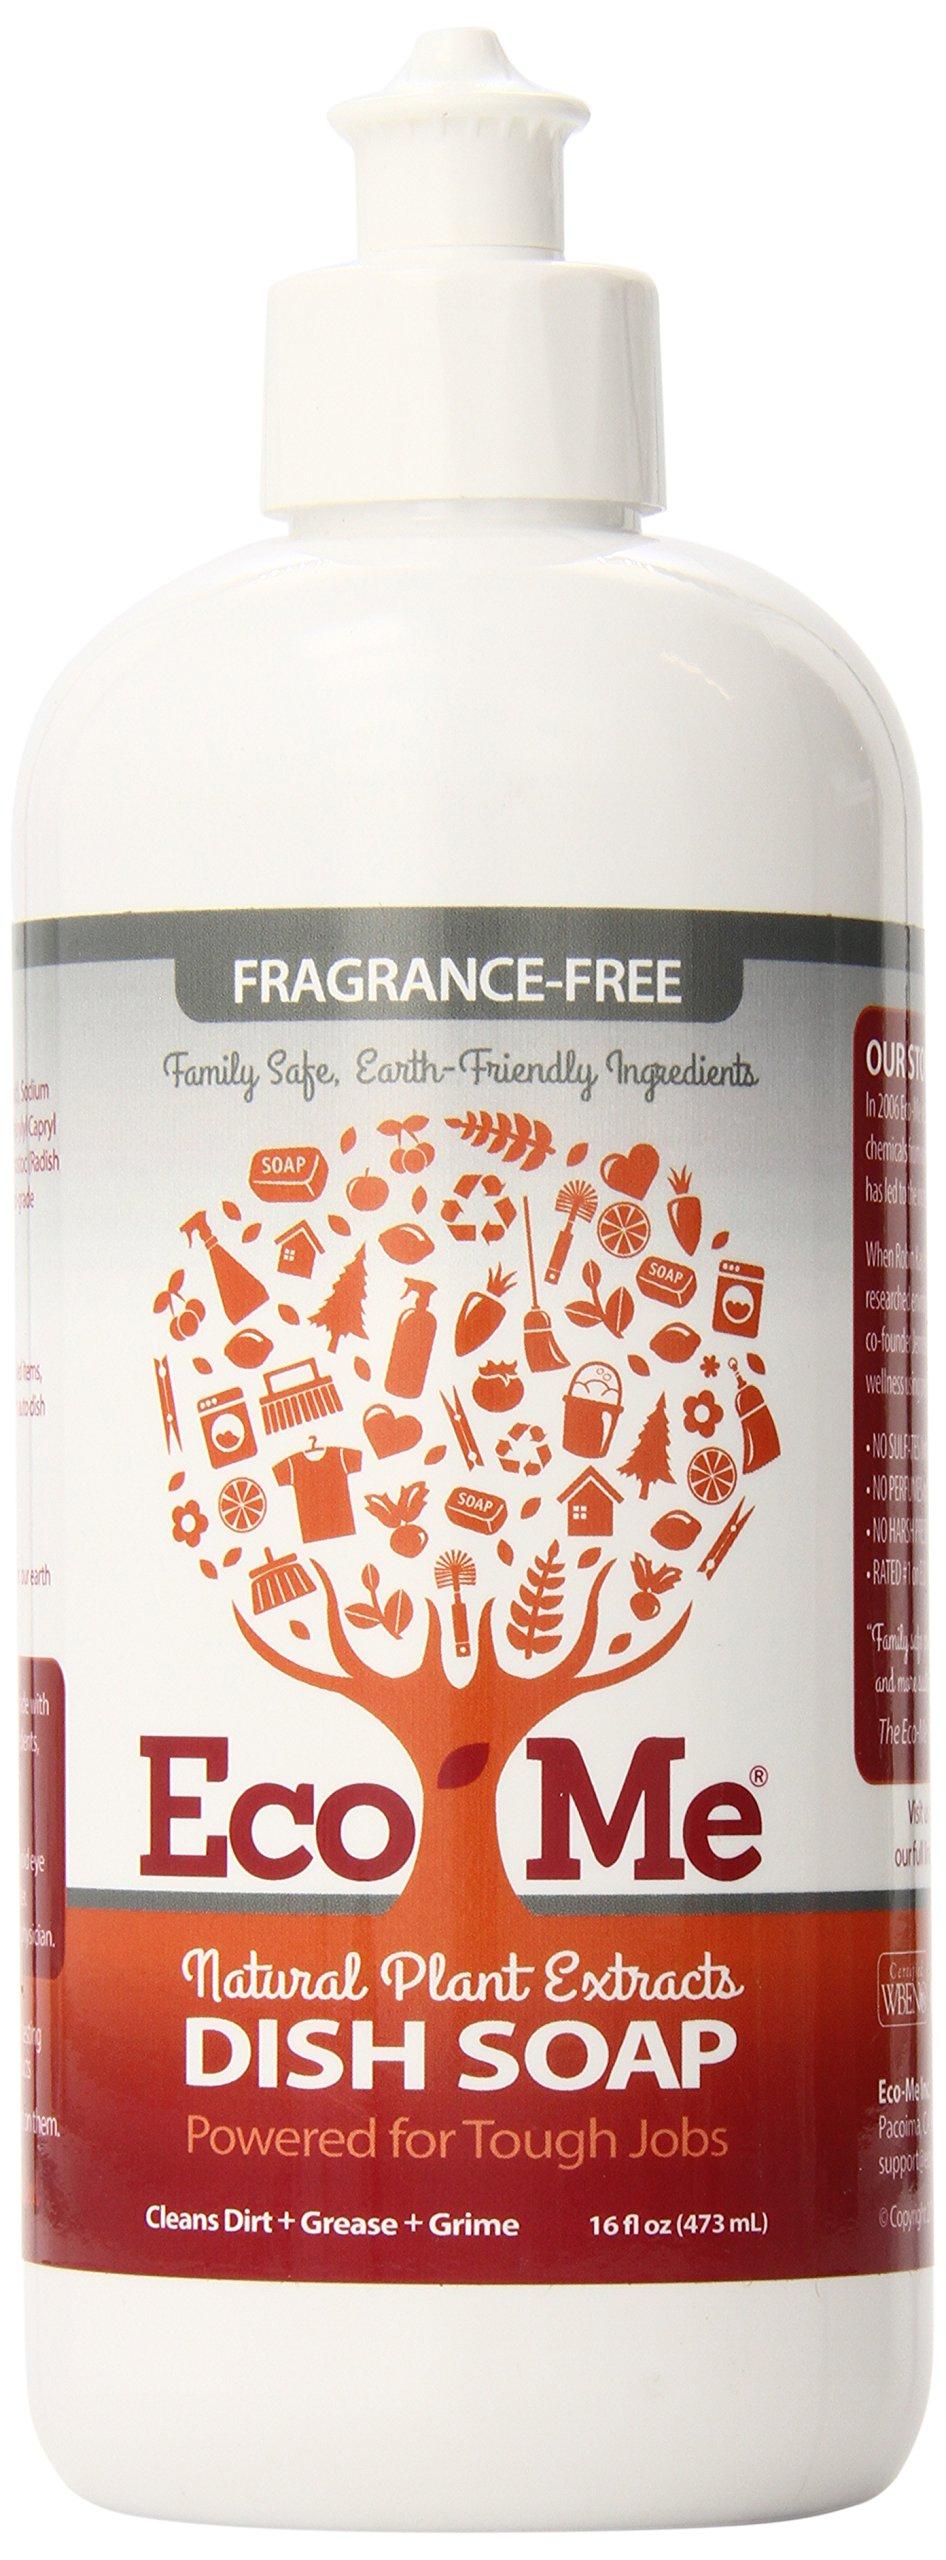 Eco-Me Dish Soap - Fragrance-Free,16 Oz